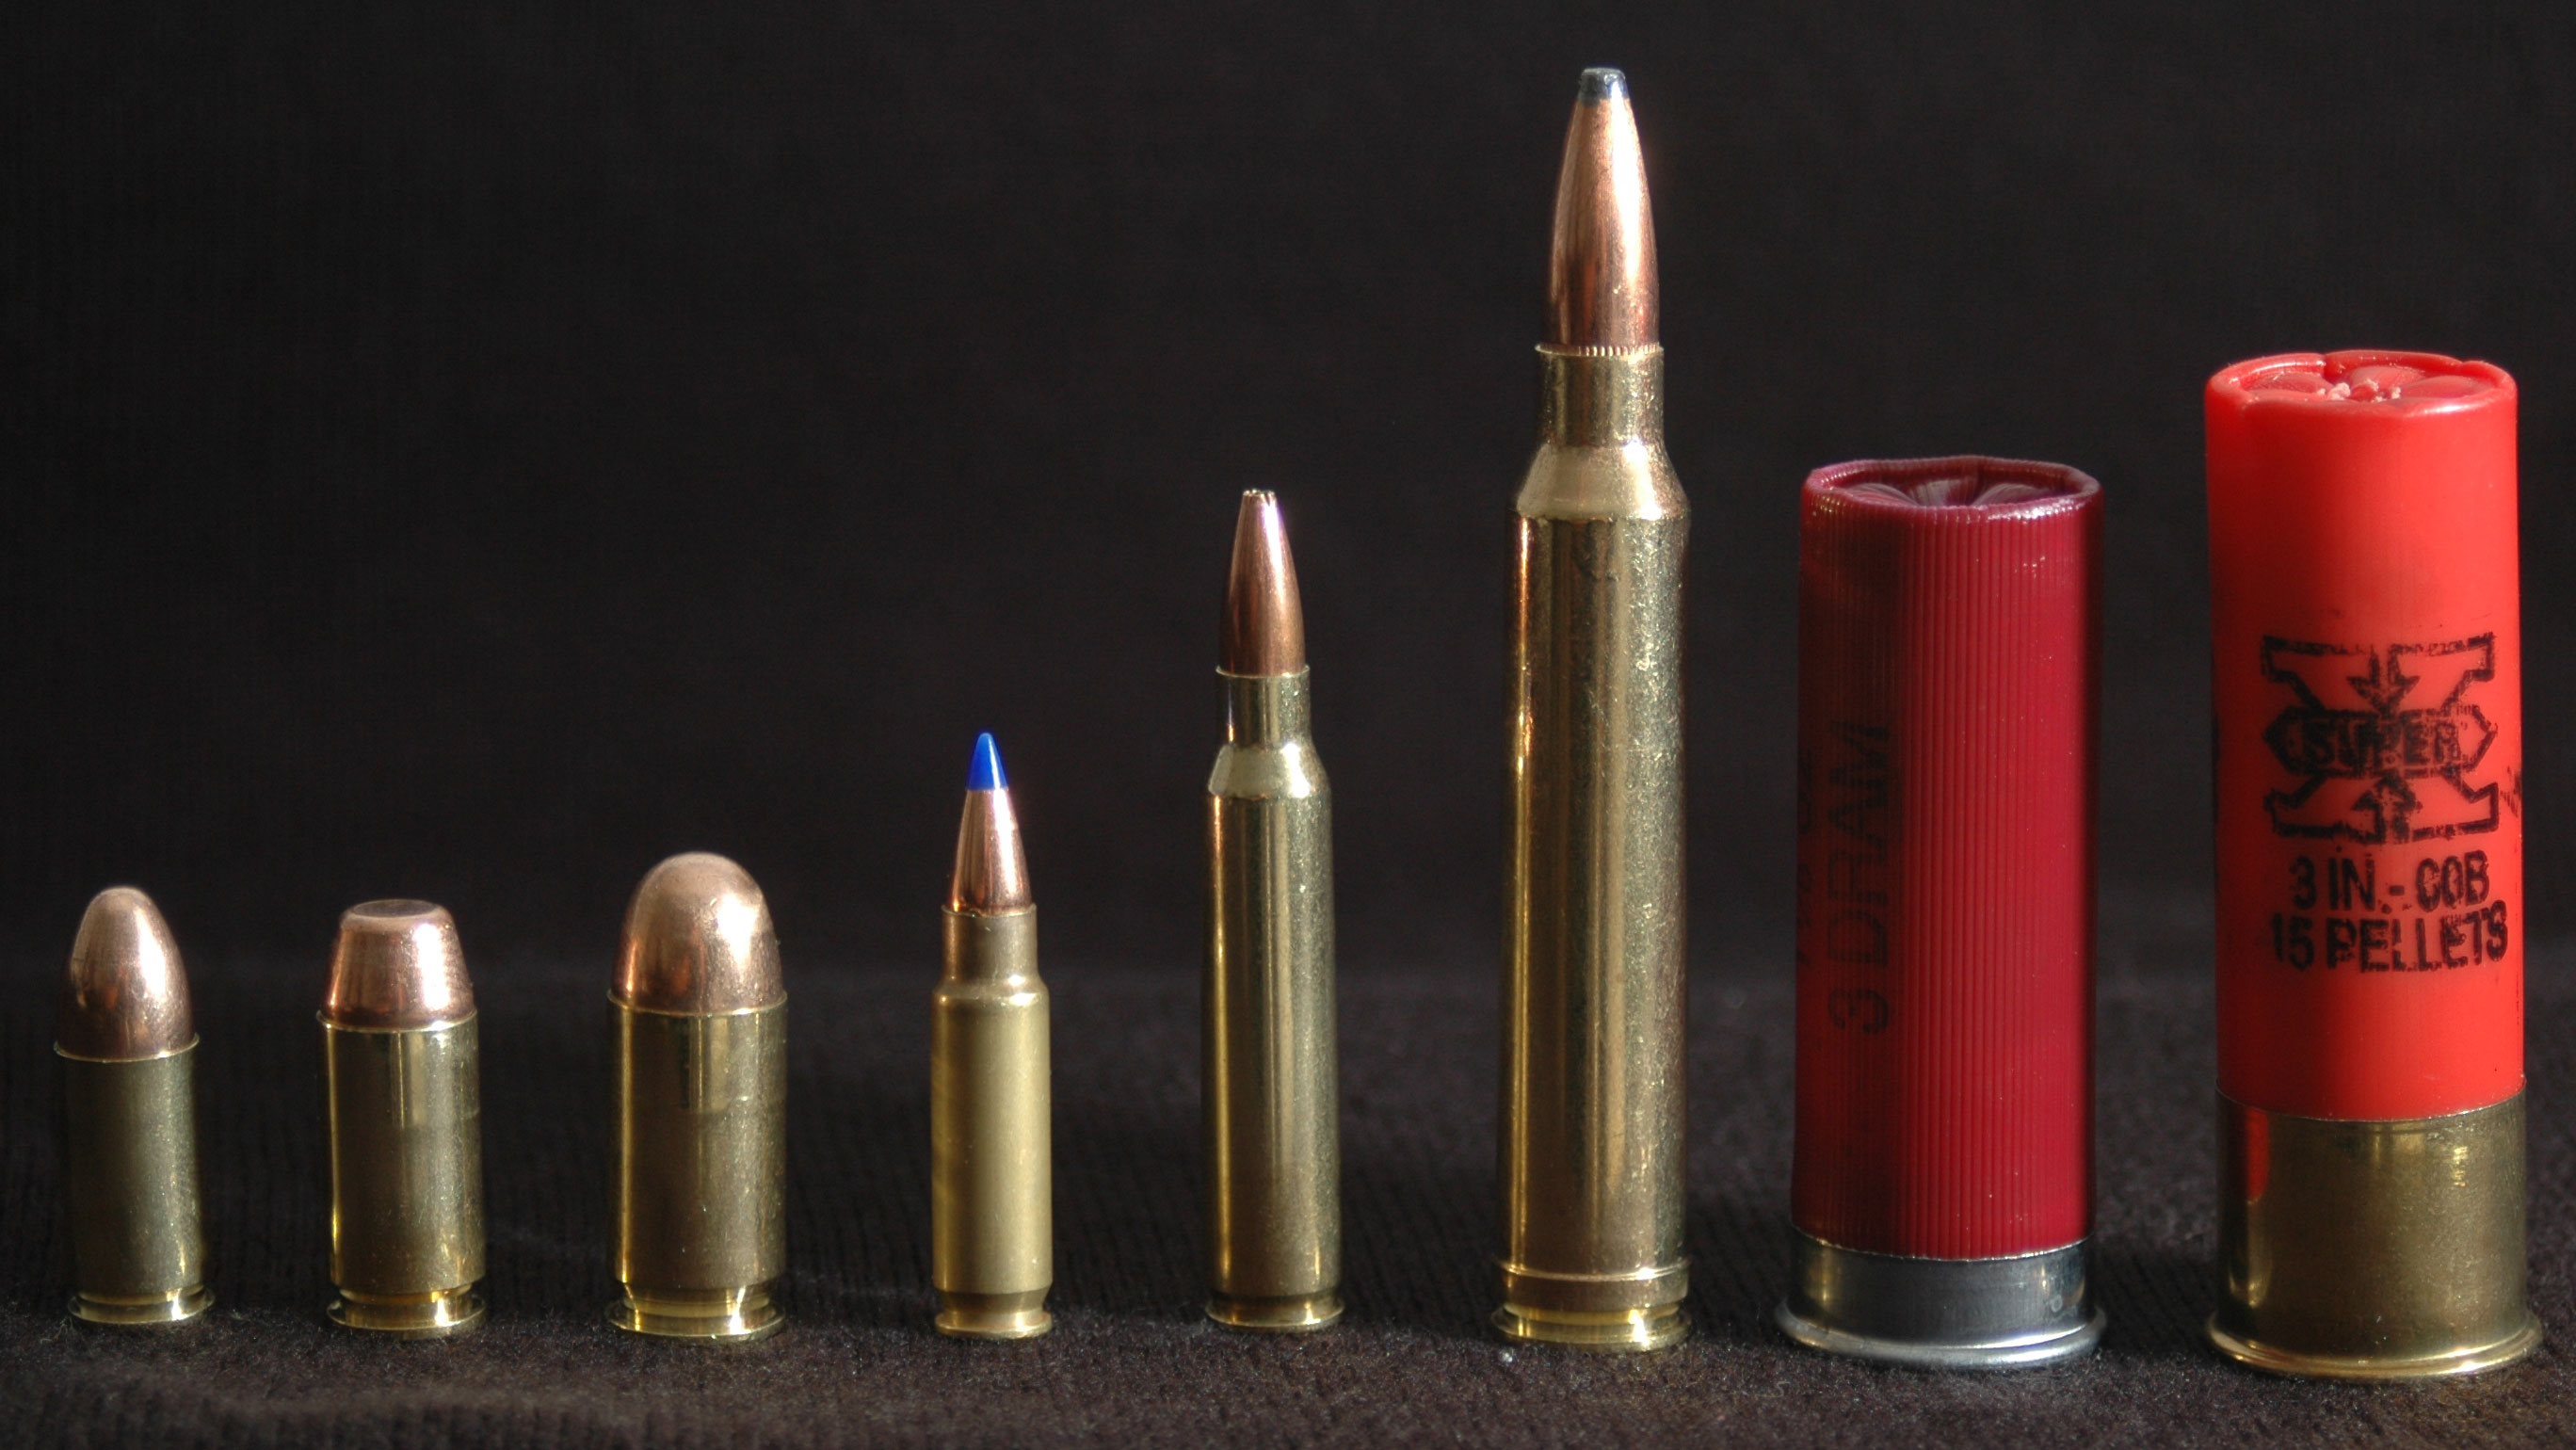 Armor piercing bullets contain